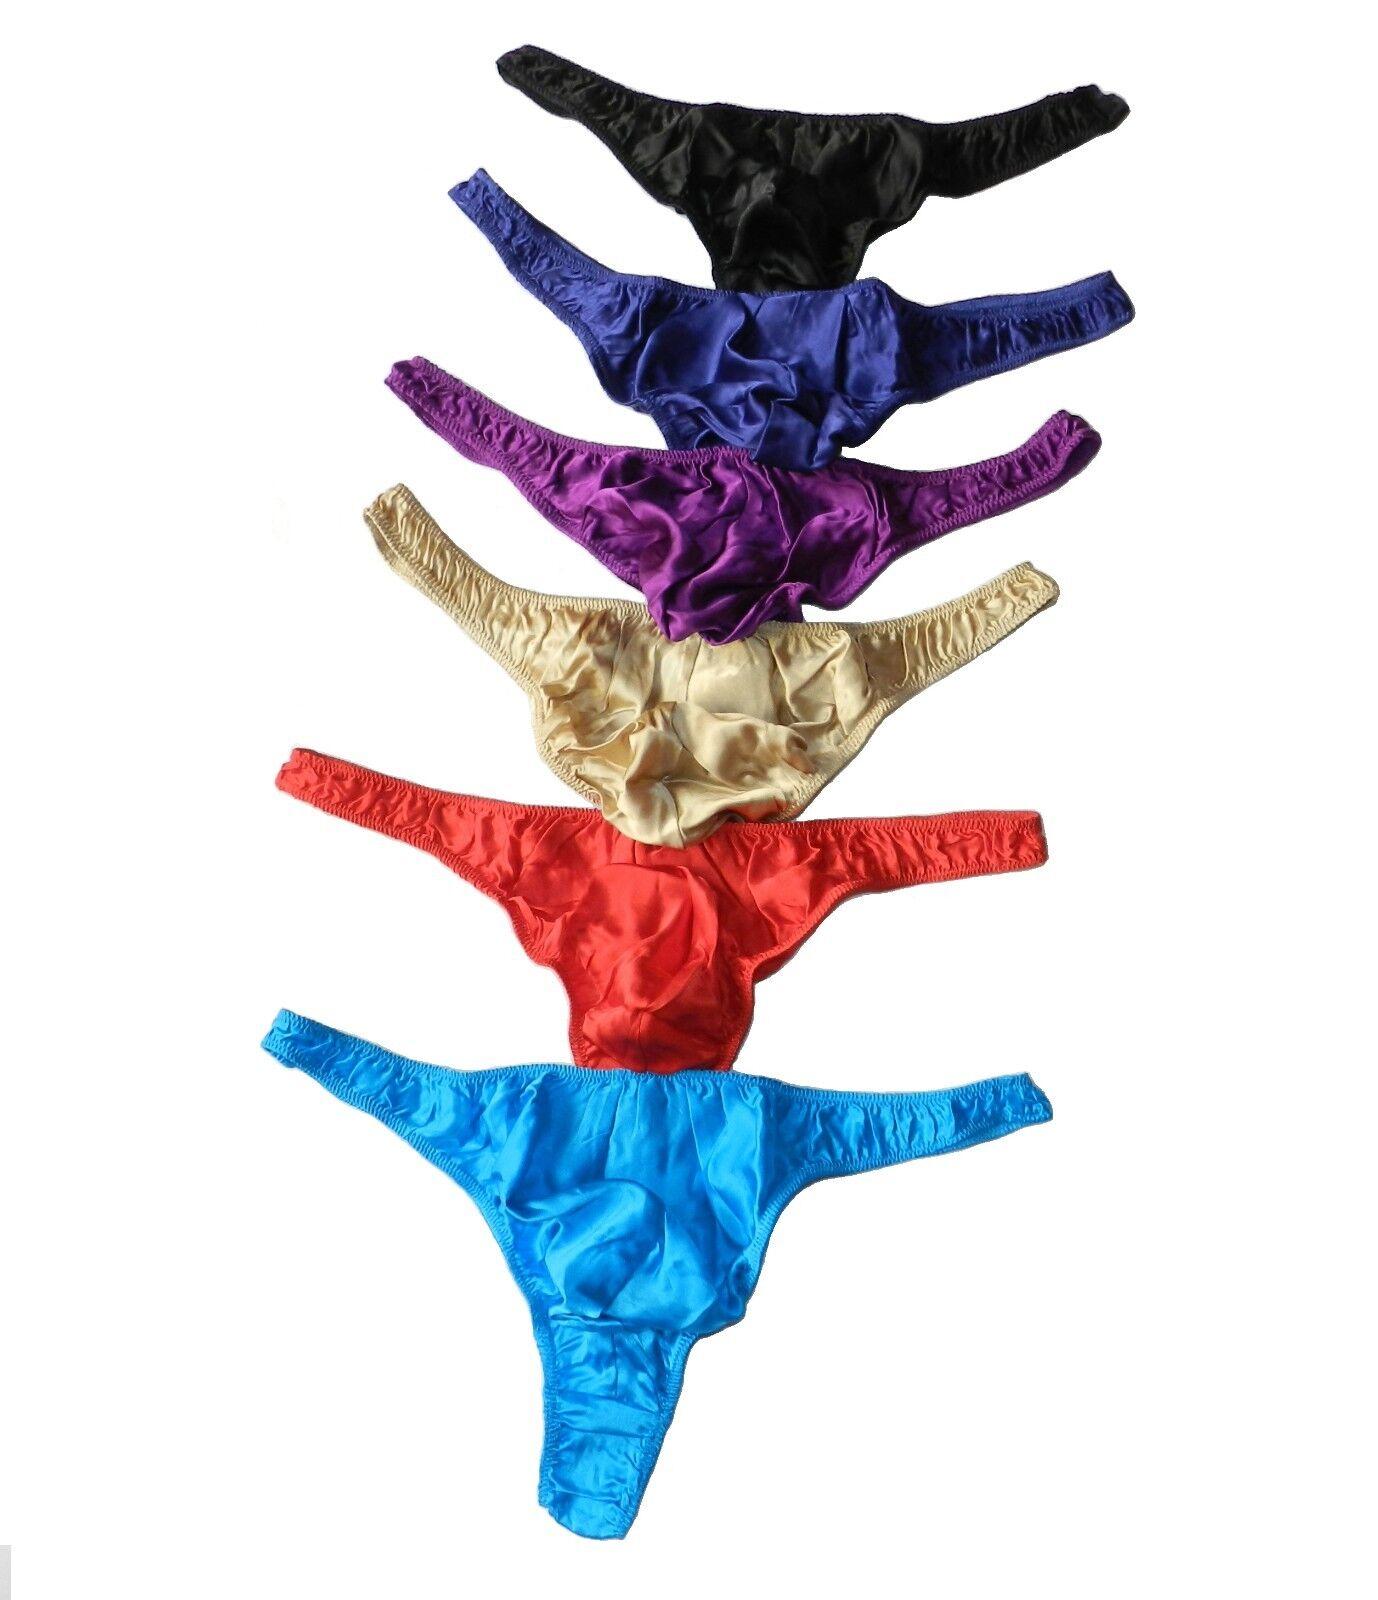 100% mulberry Silk 6 Pairs  Men's Thong Briefs Size M L XL XXL